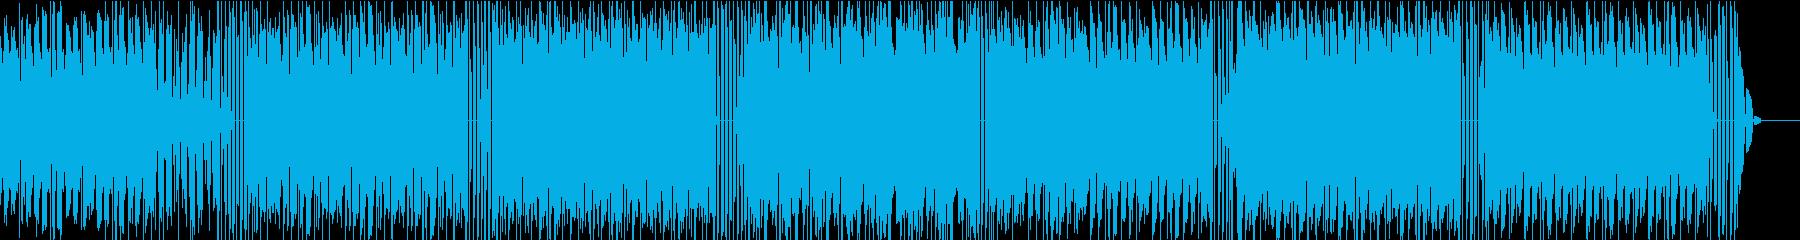 DJリミックス風のダンスミュージックの再生済みの波形